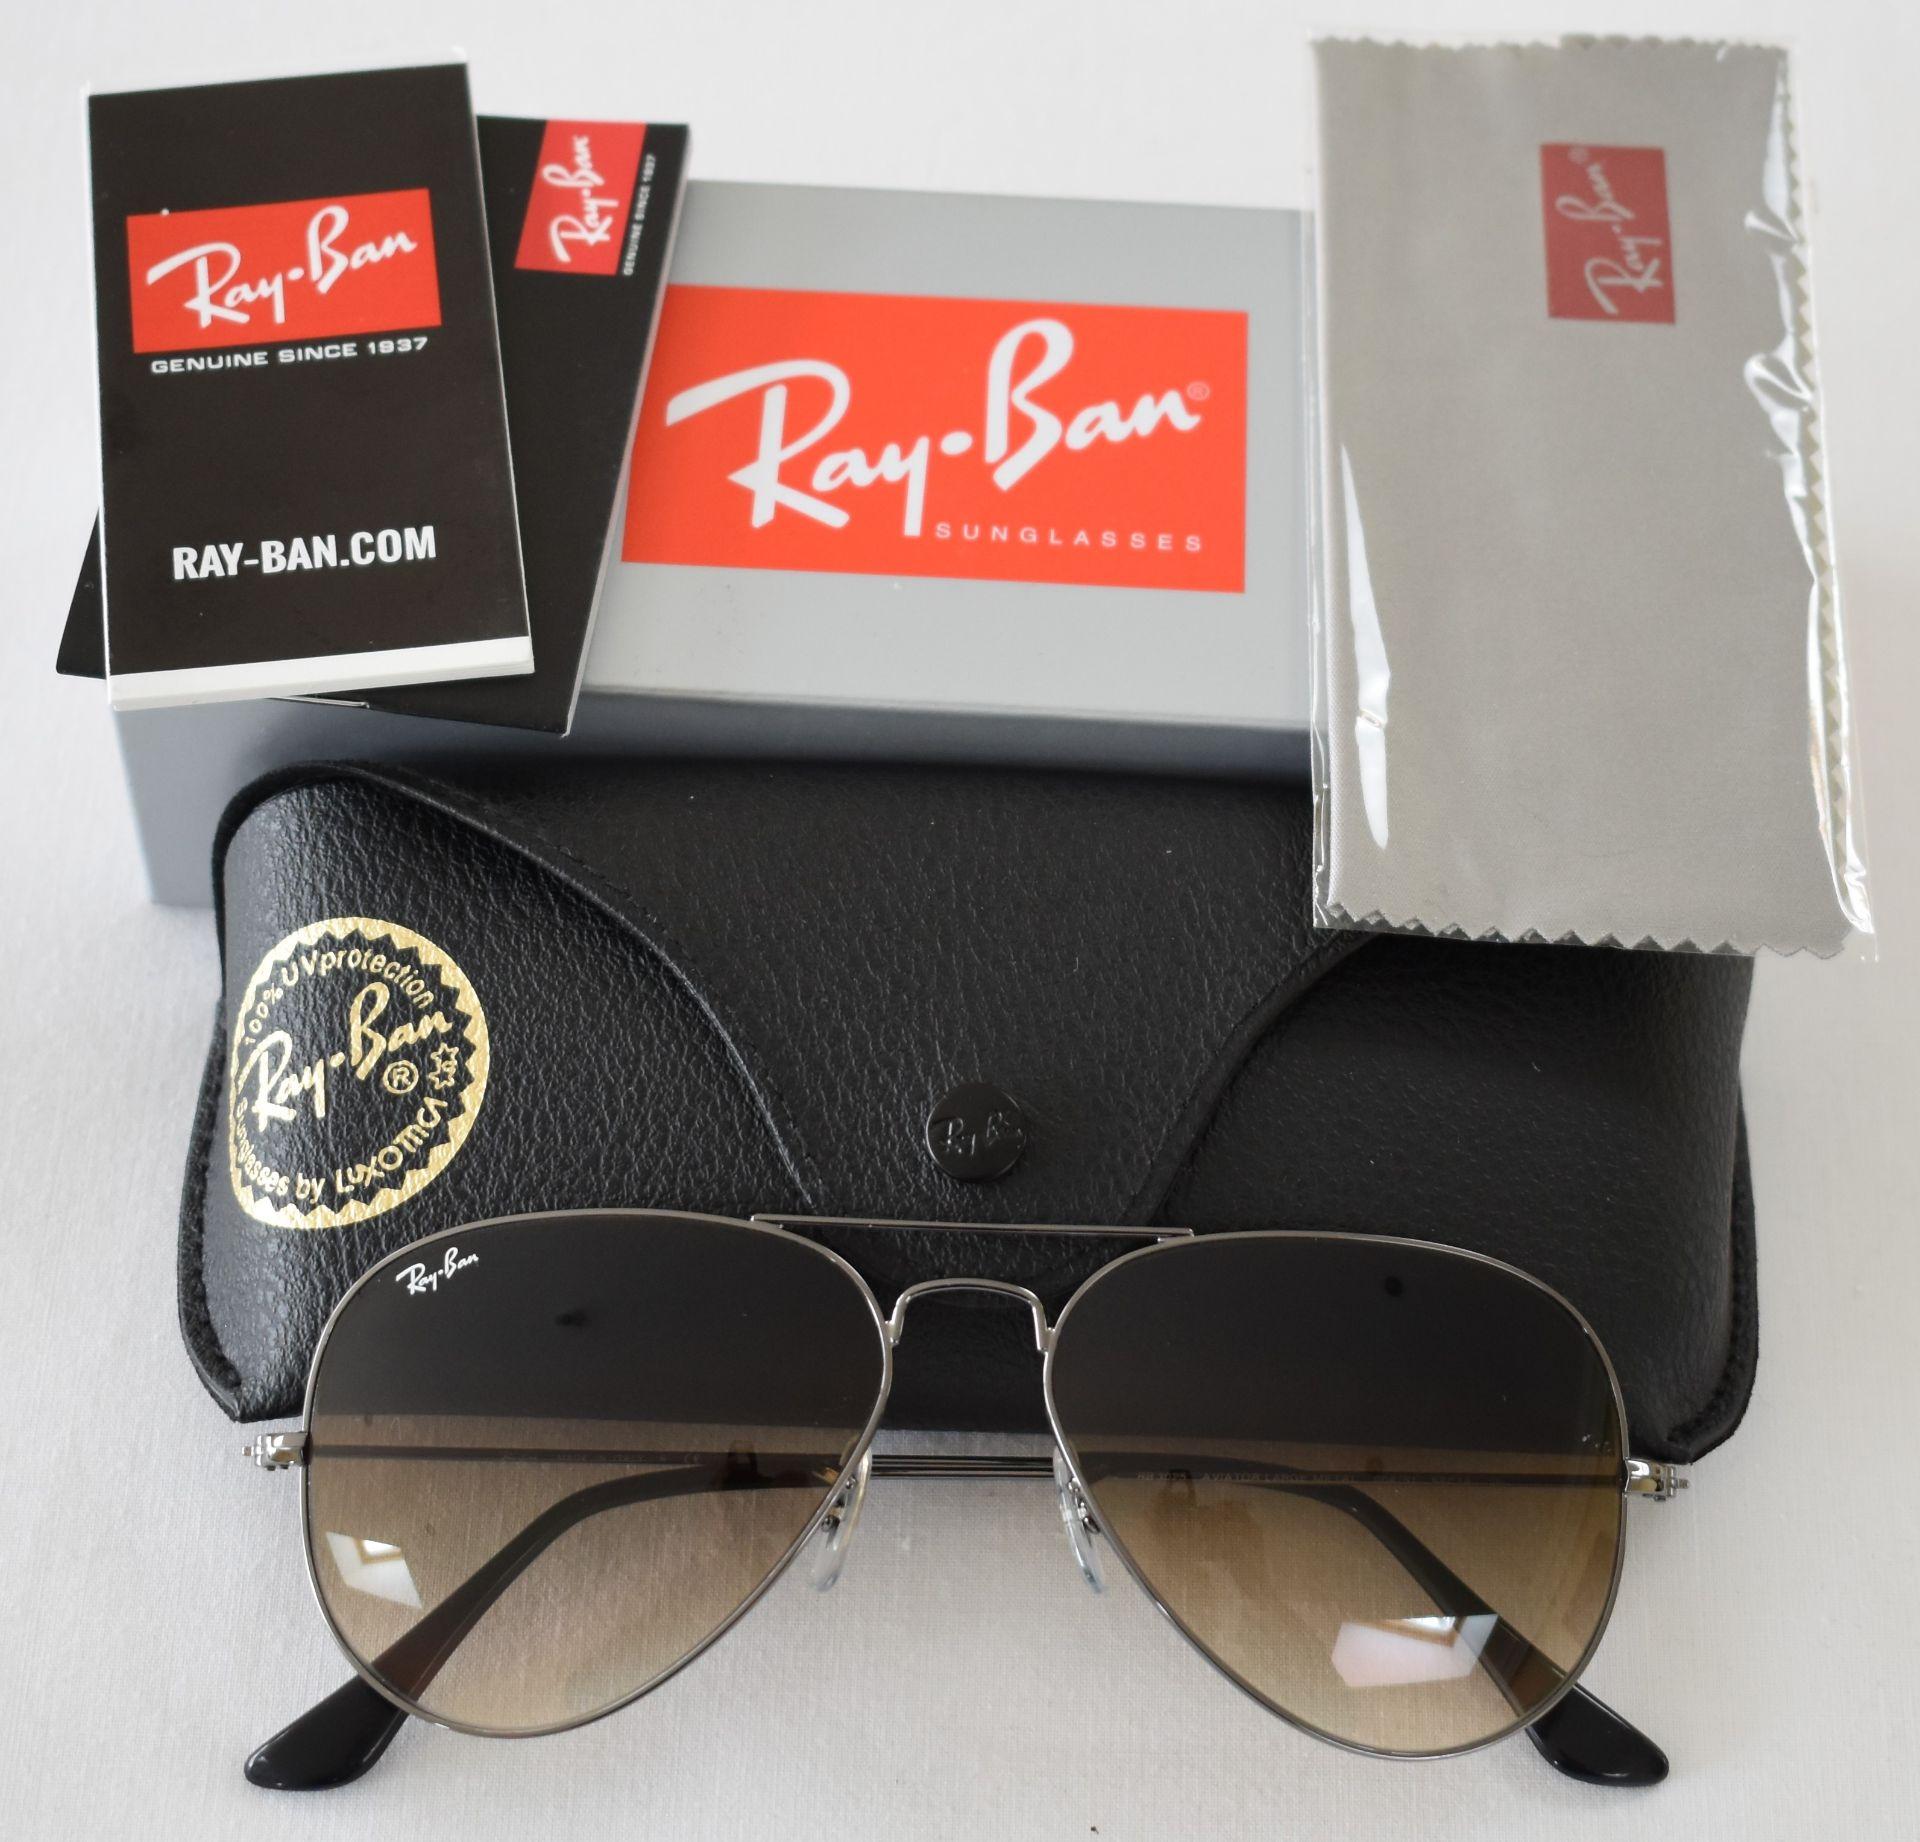 Ray Ban Sunglasses ORB3025 004/51 *2N - Image 2 of 2